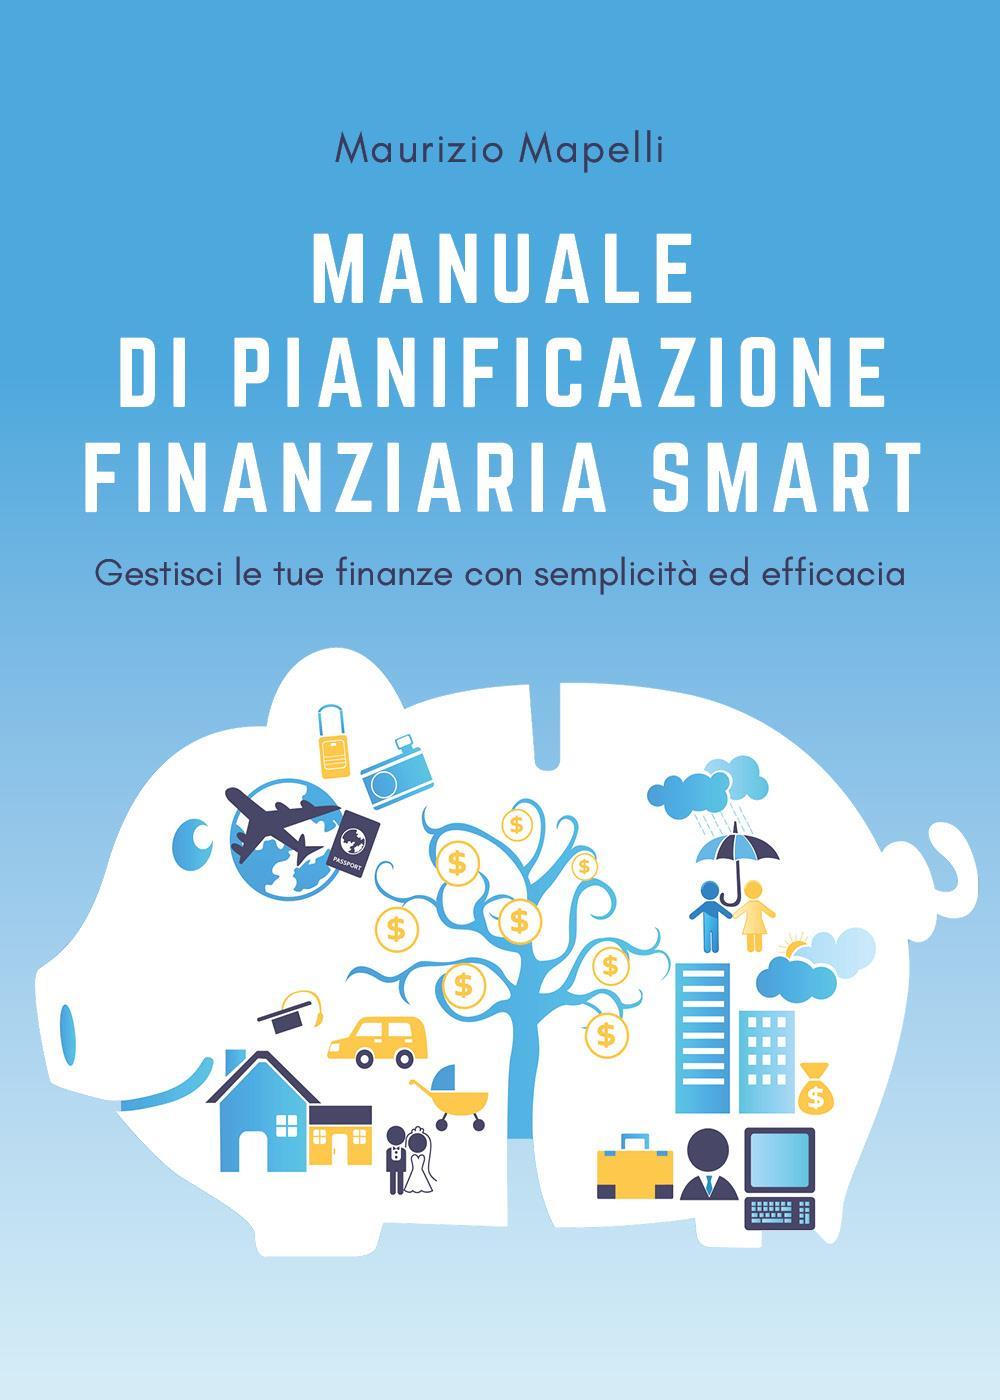 Manuale di pianificazione finanziaria Smart